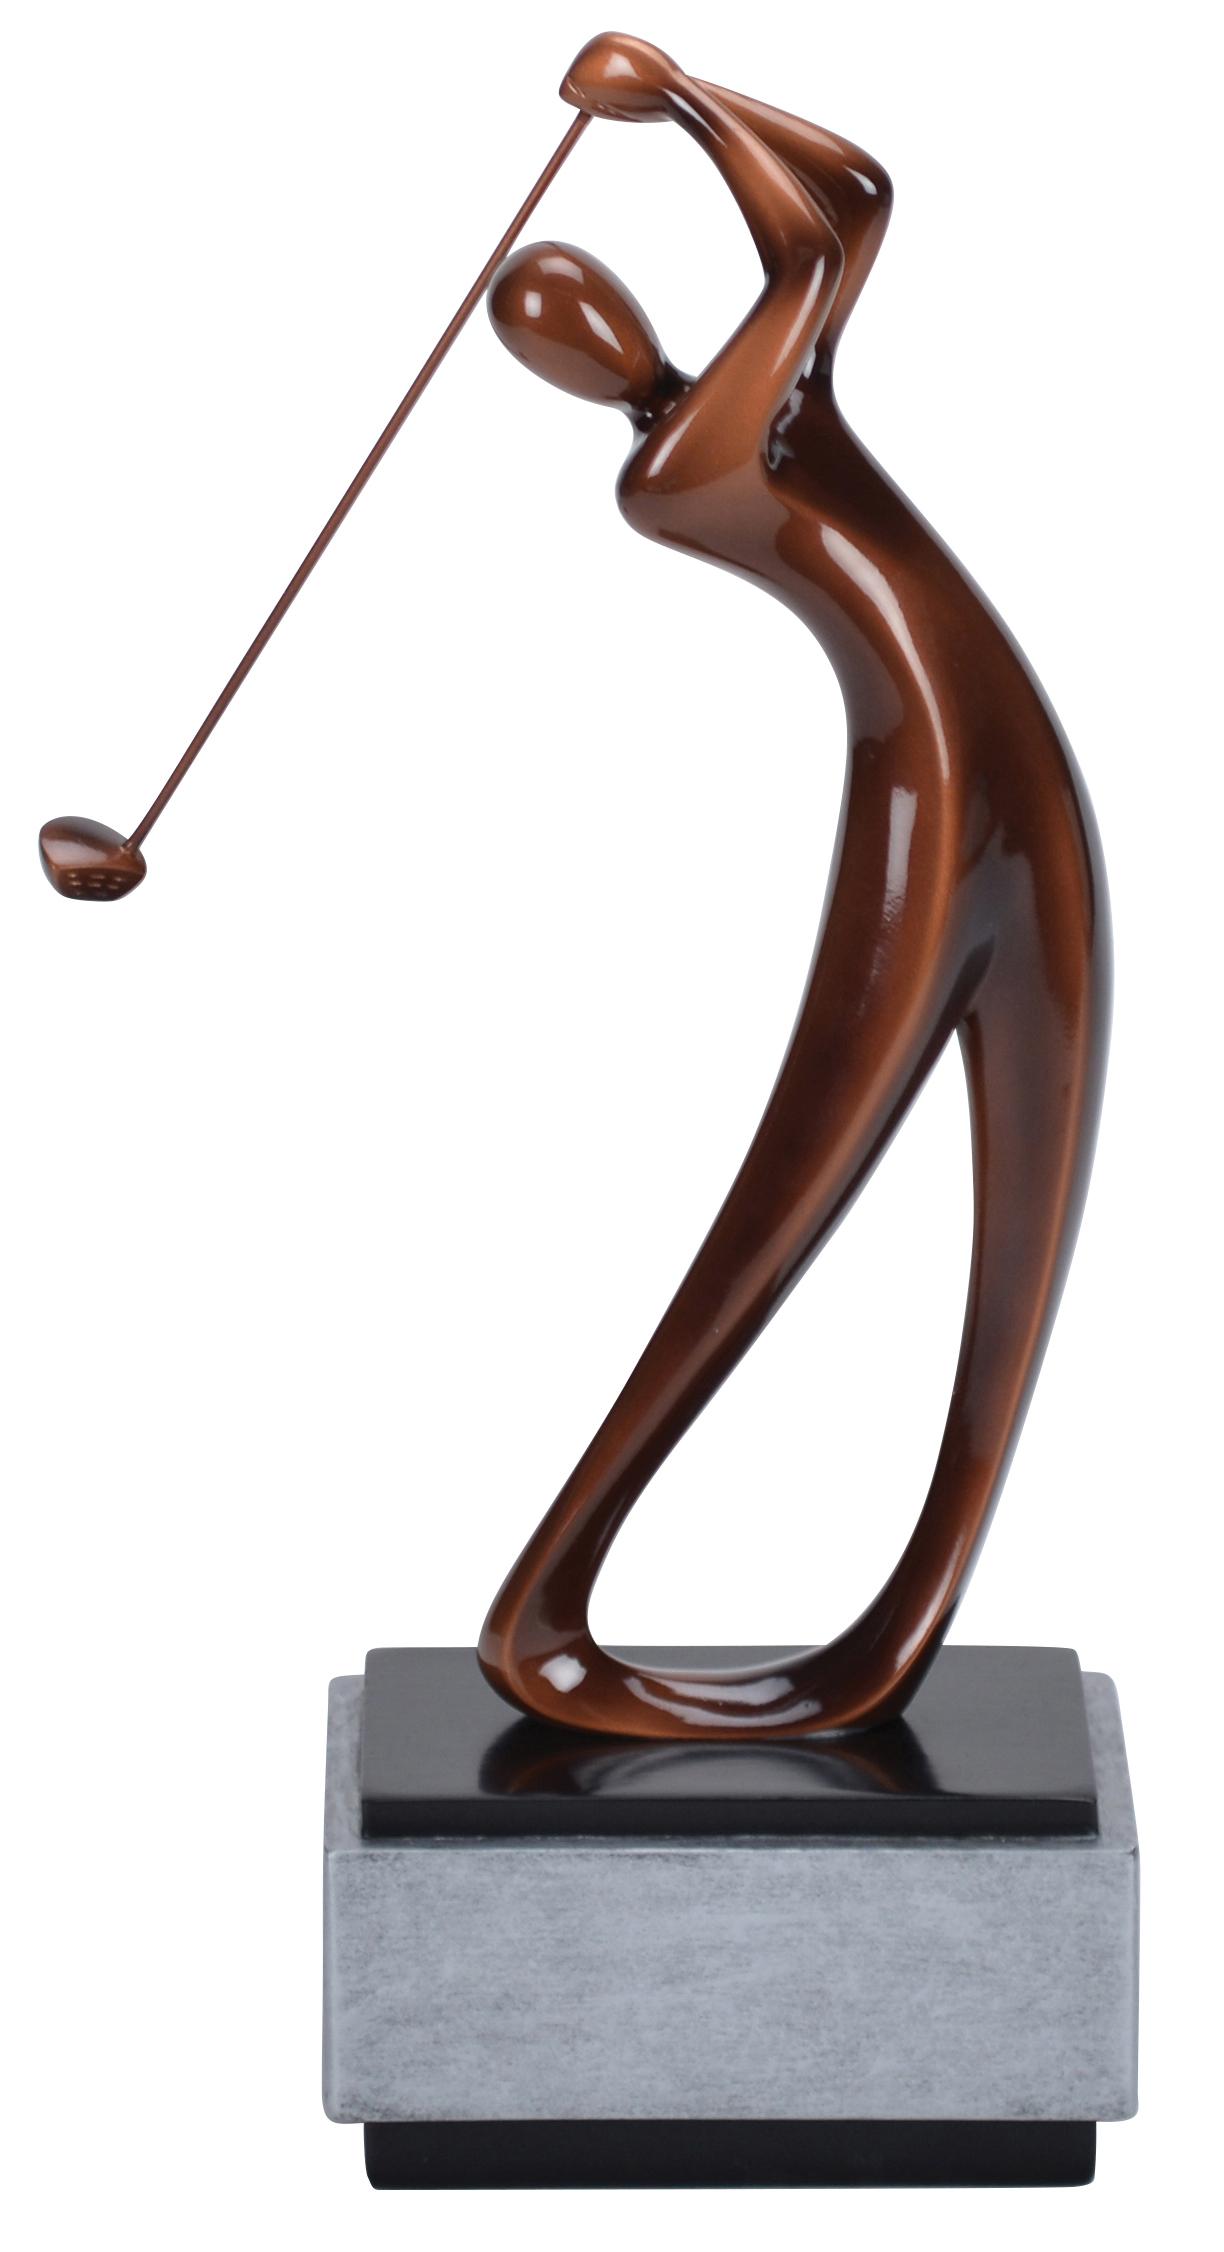 "Modern Golf Resin - Male    Large -  69621-Z - 16"" tall -  $106    Medium -  68621-Z - 14"" tall - $82    Small -  67621-Z - 12"" tall -  $58"